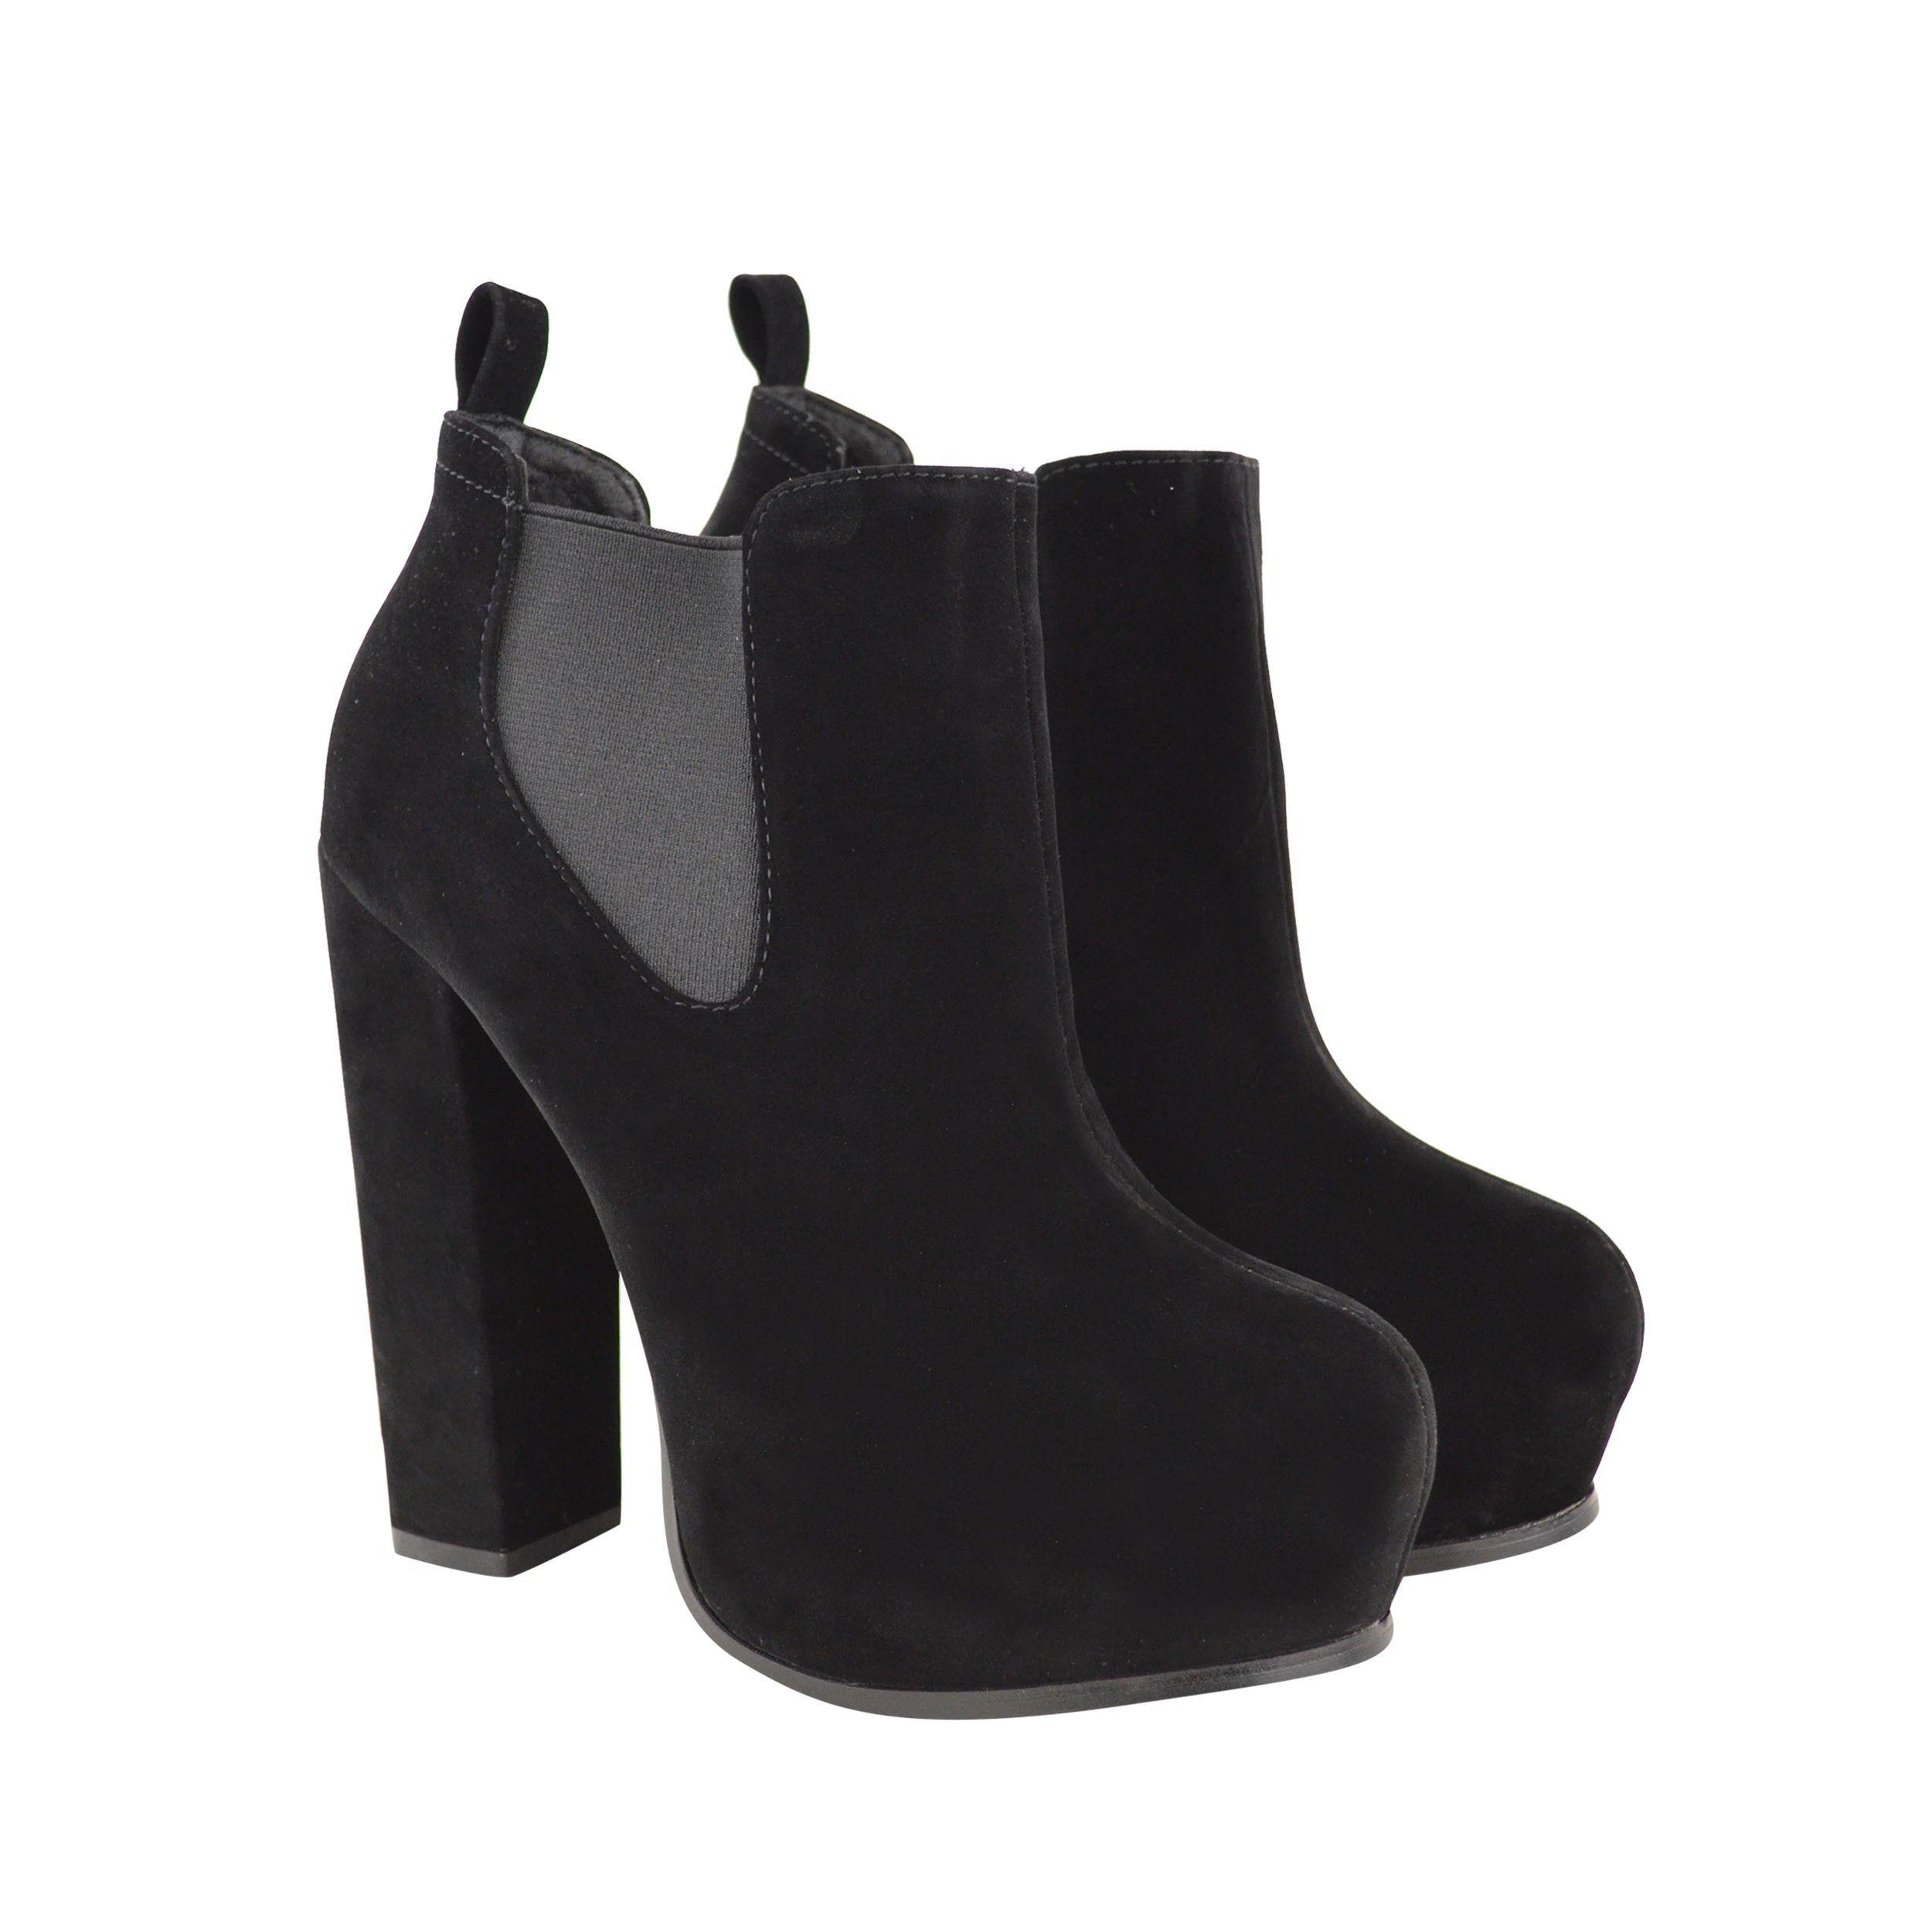 Boots, Suede high heel boots